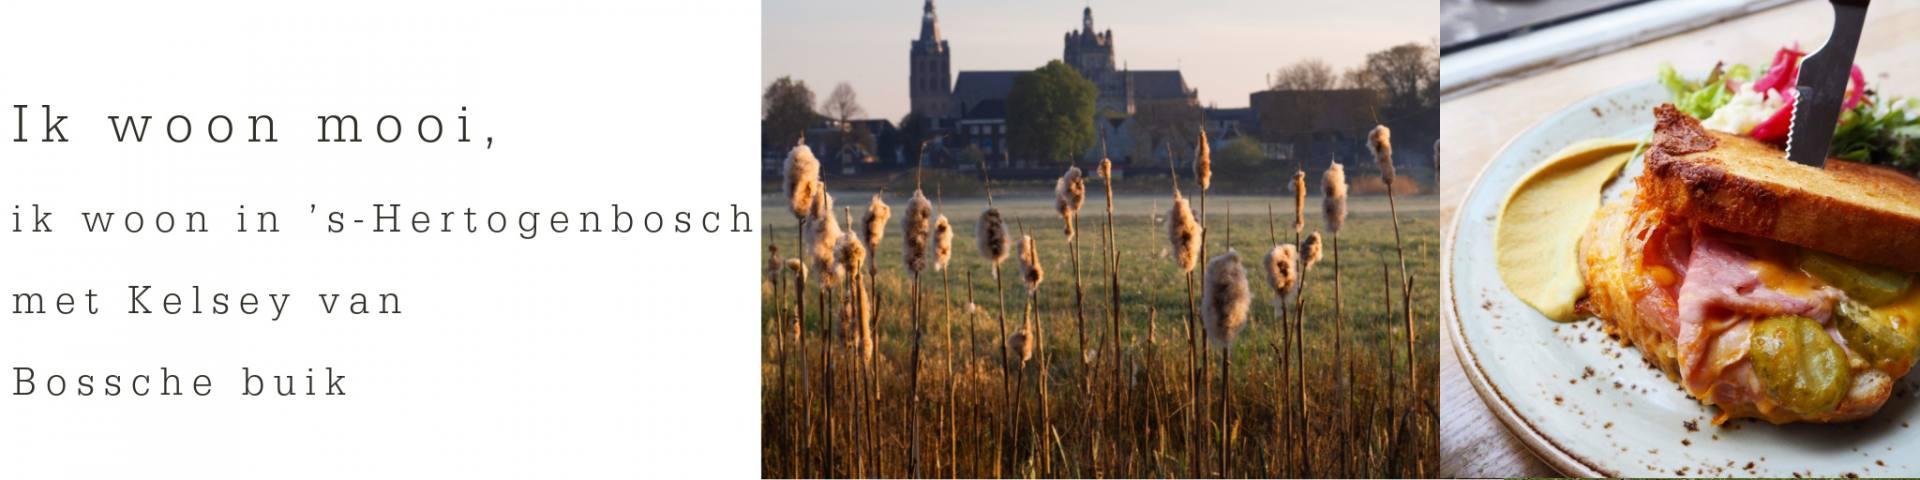 Ik woon mooi, ik woon in 's-Hertogenbosch / met Kelsey